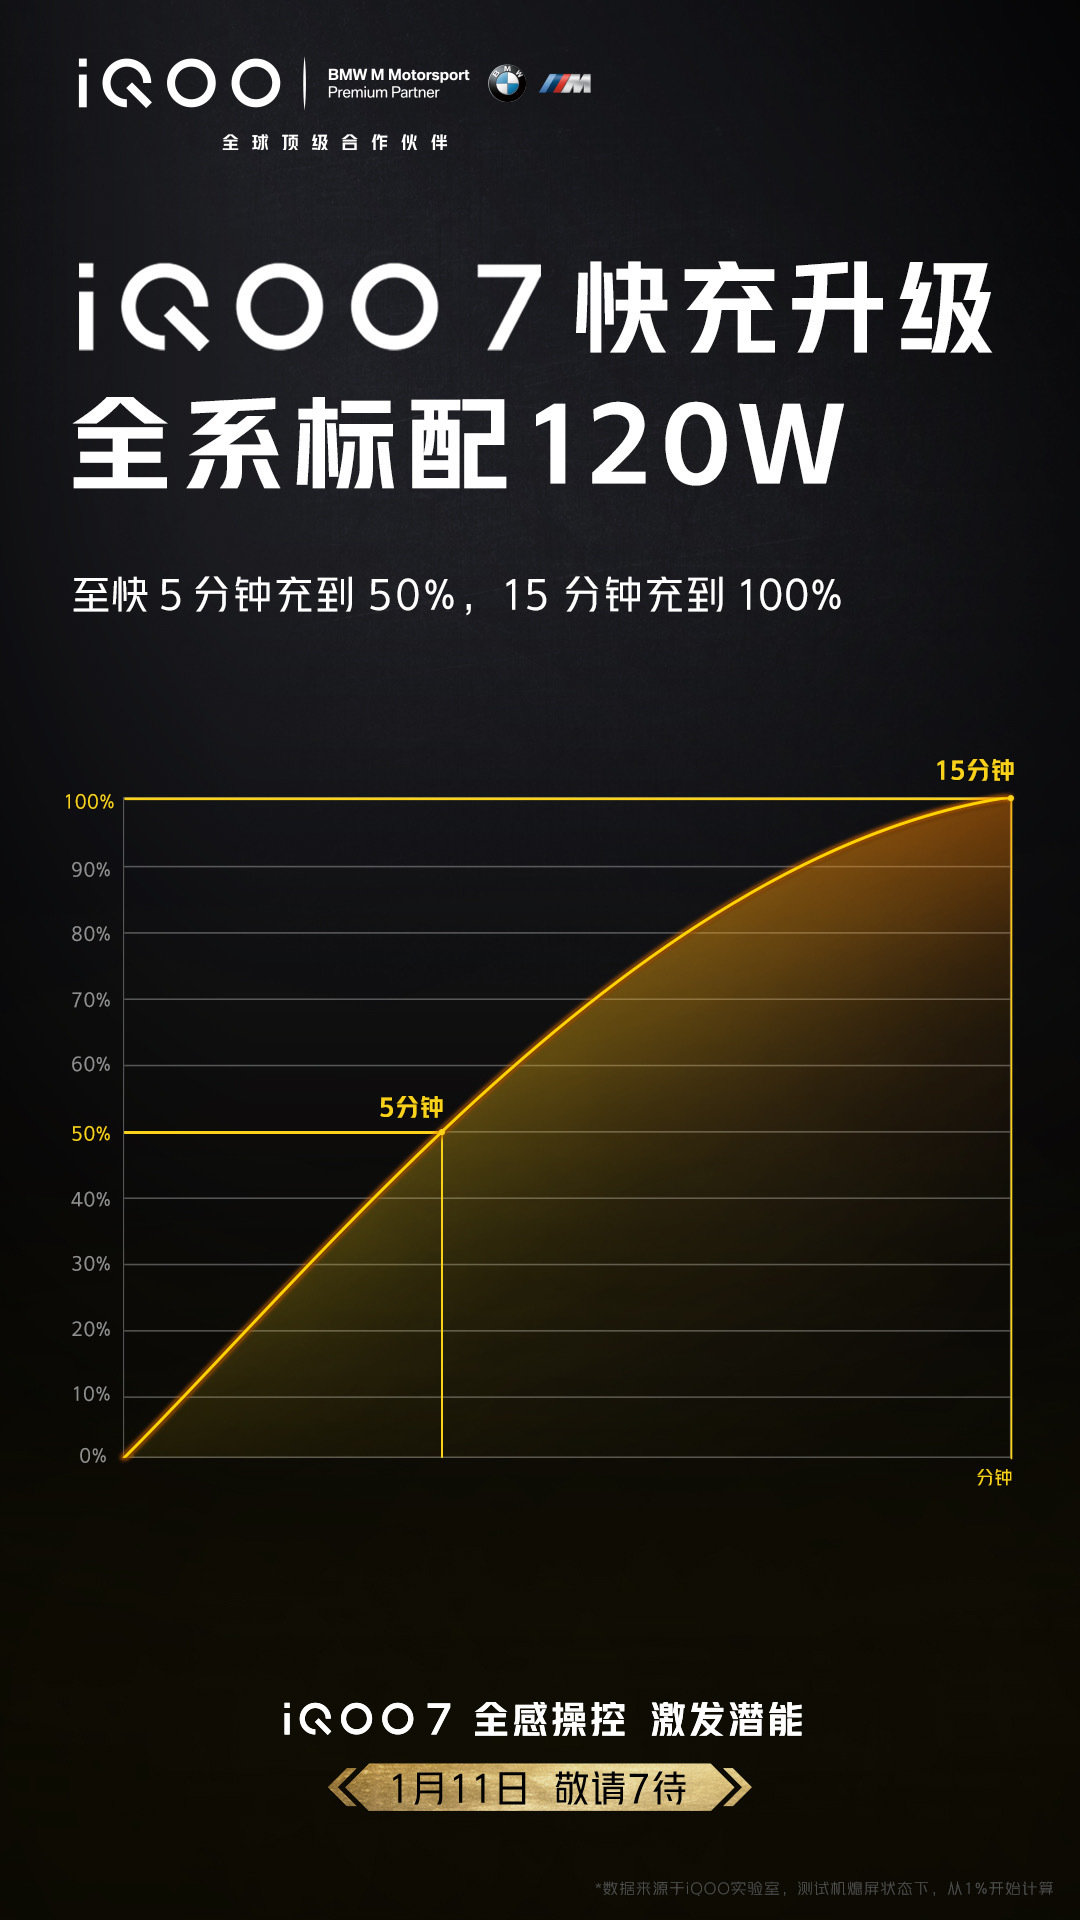 iQOO 7 操控升级:双压感灵敏触控 + 120Hz 刷新率 - 热点资讯 每日推荐 第3张